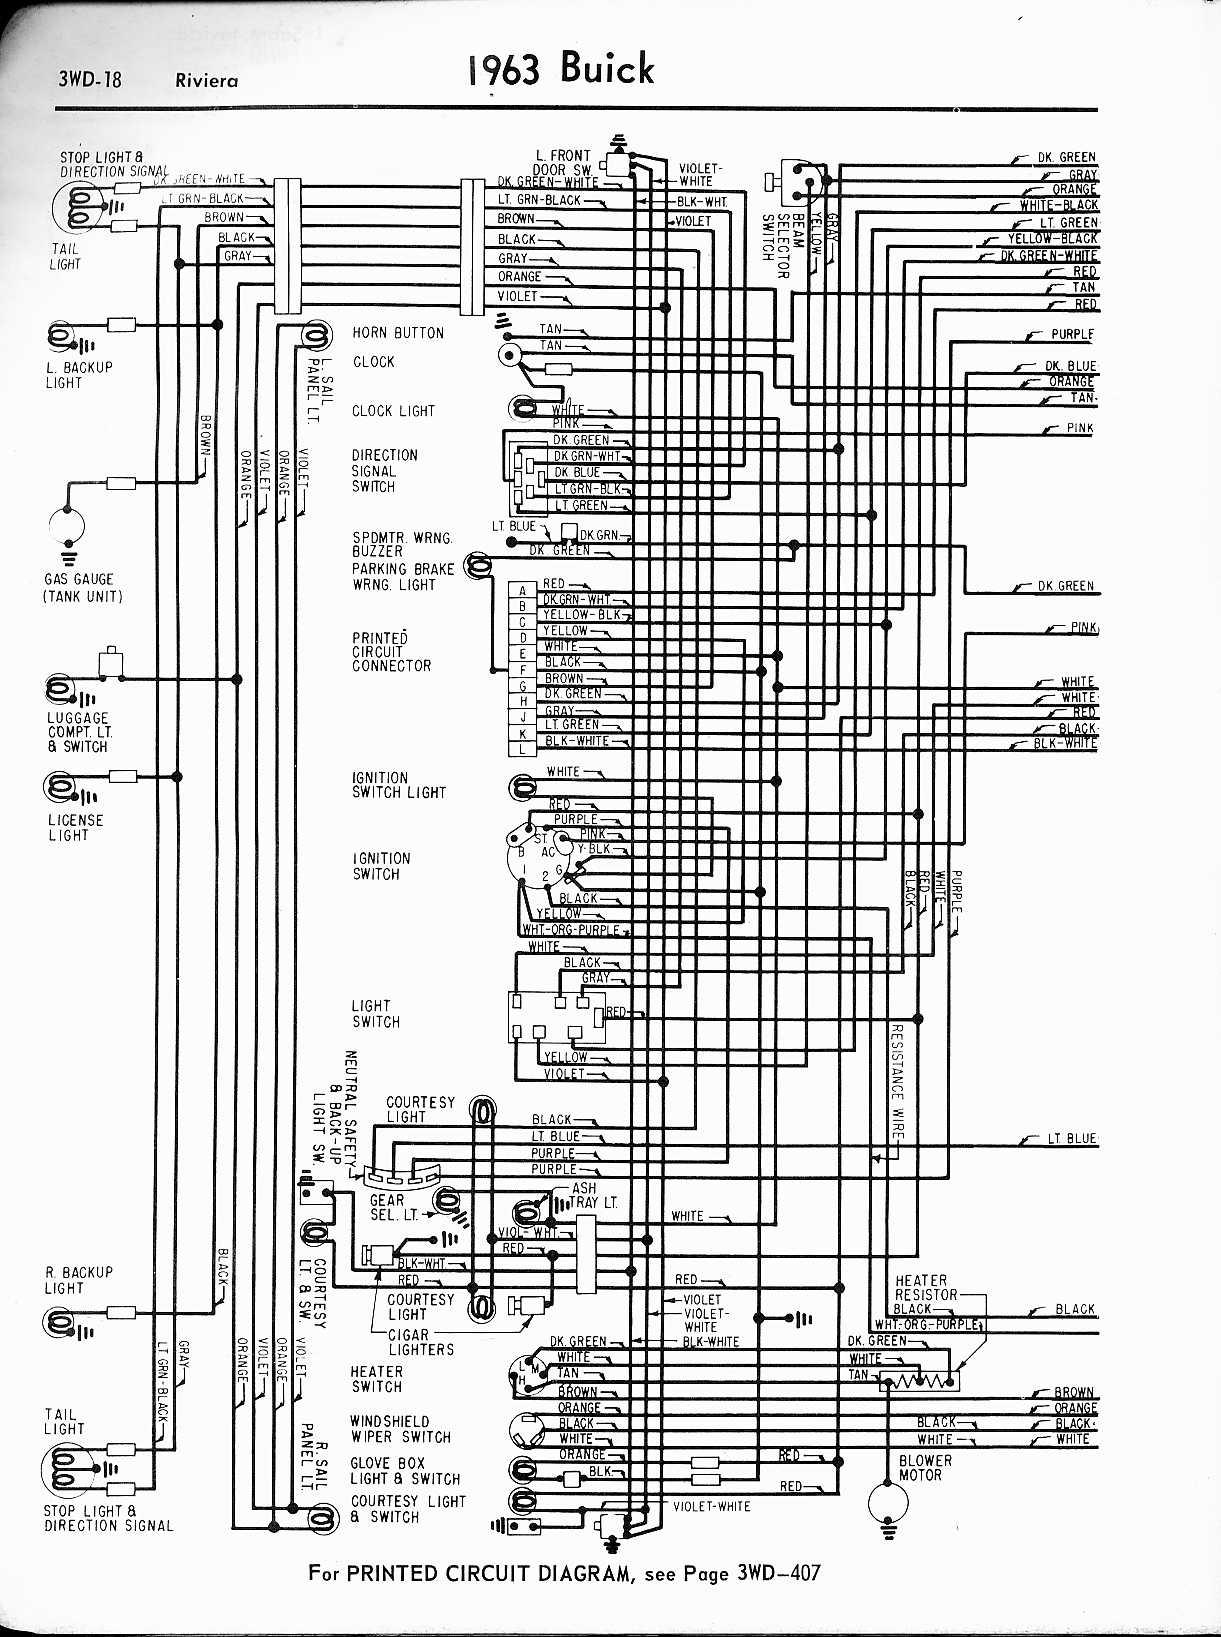 67 buick wiring diagram vn 0771  1968 buick skylark wiring diagram schematic wiring  1968 buick skylark wiring diagram